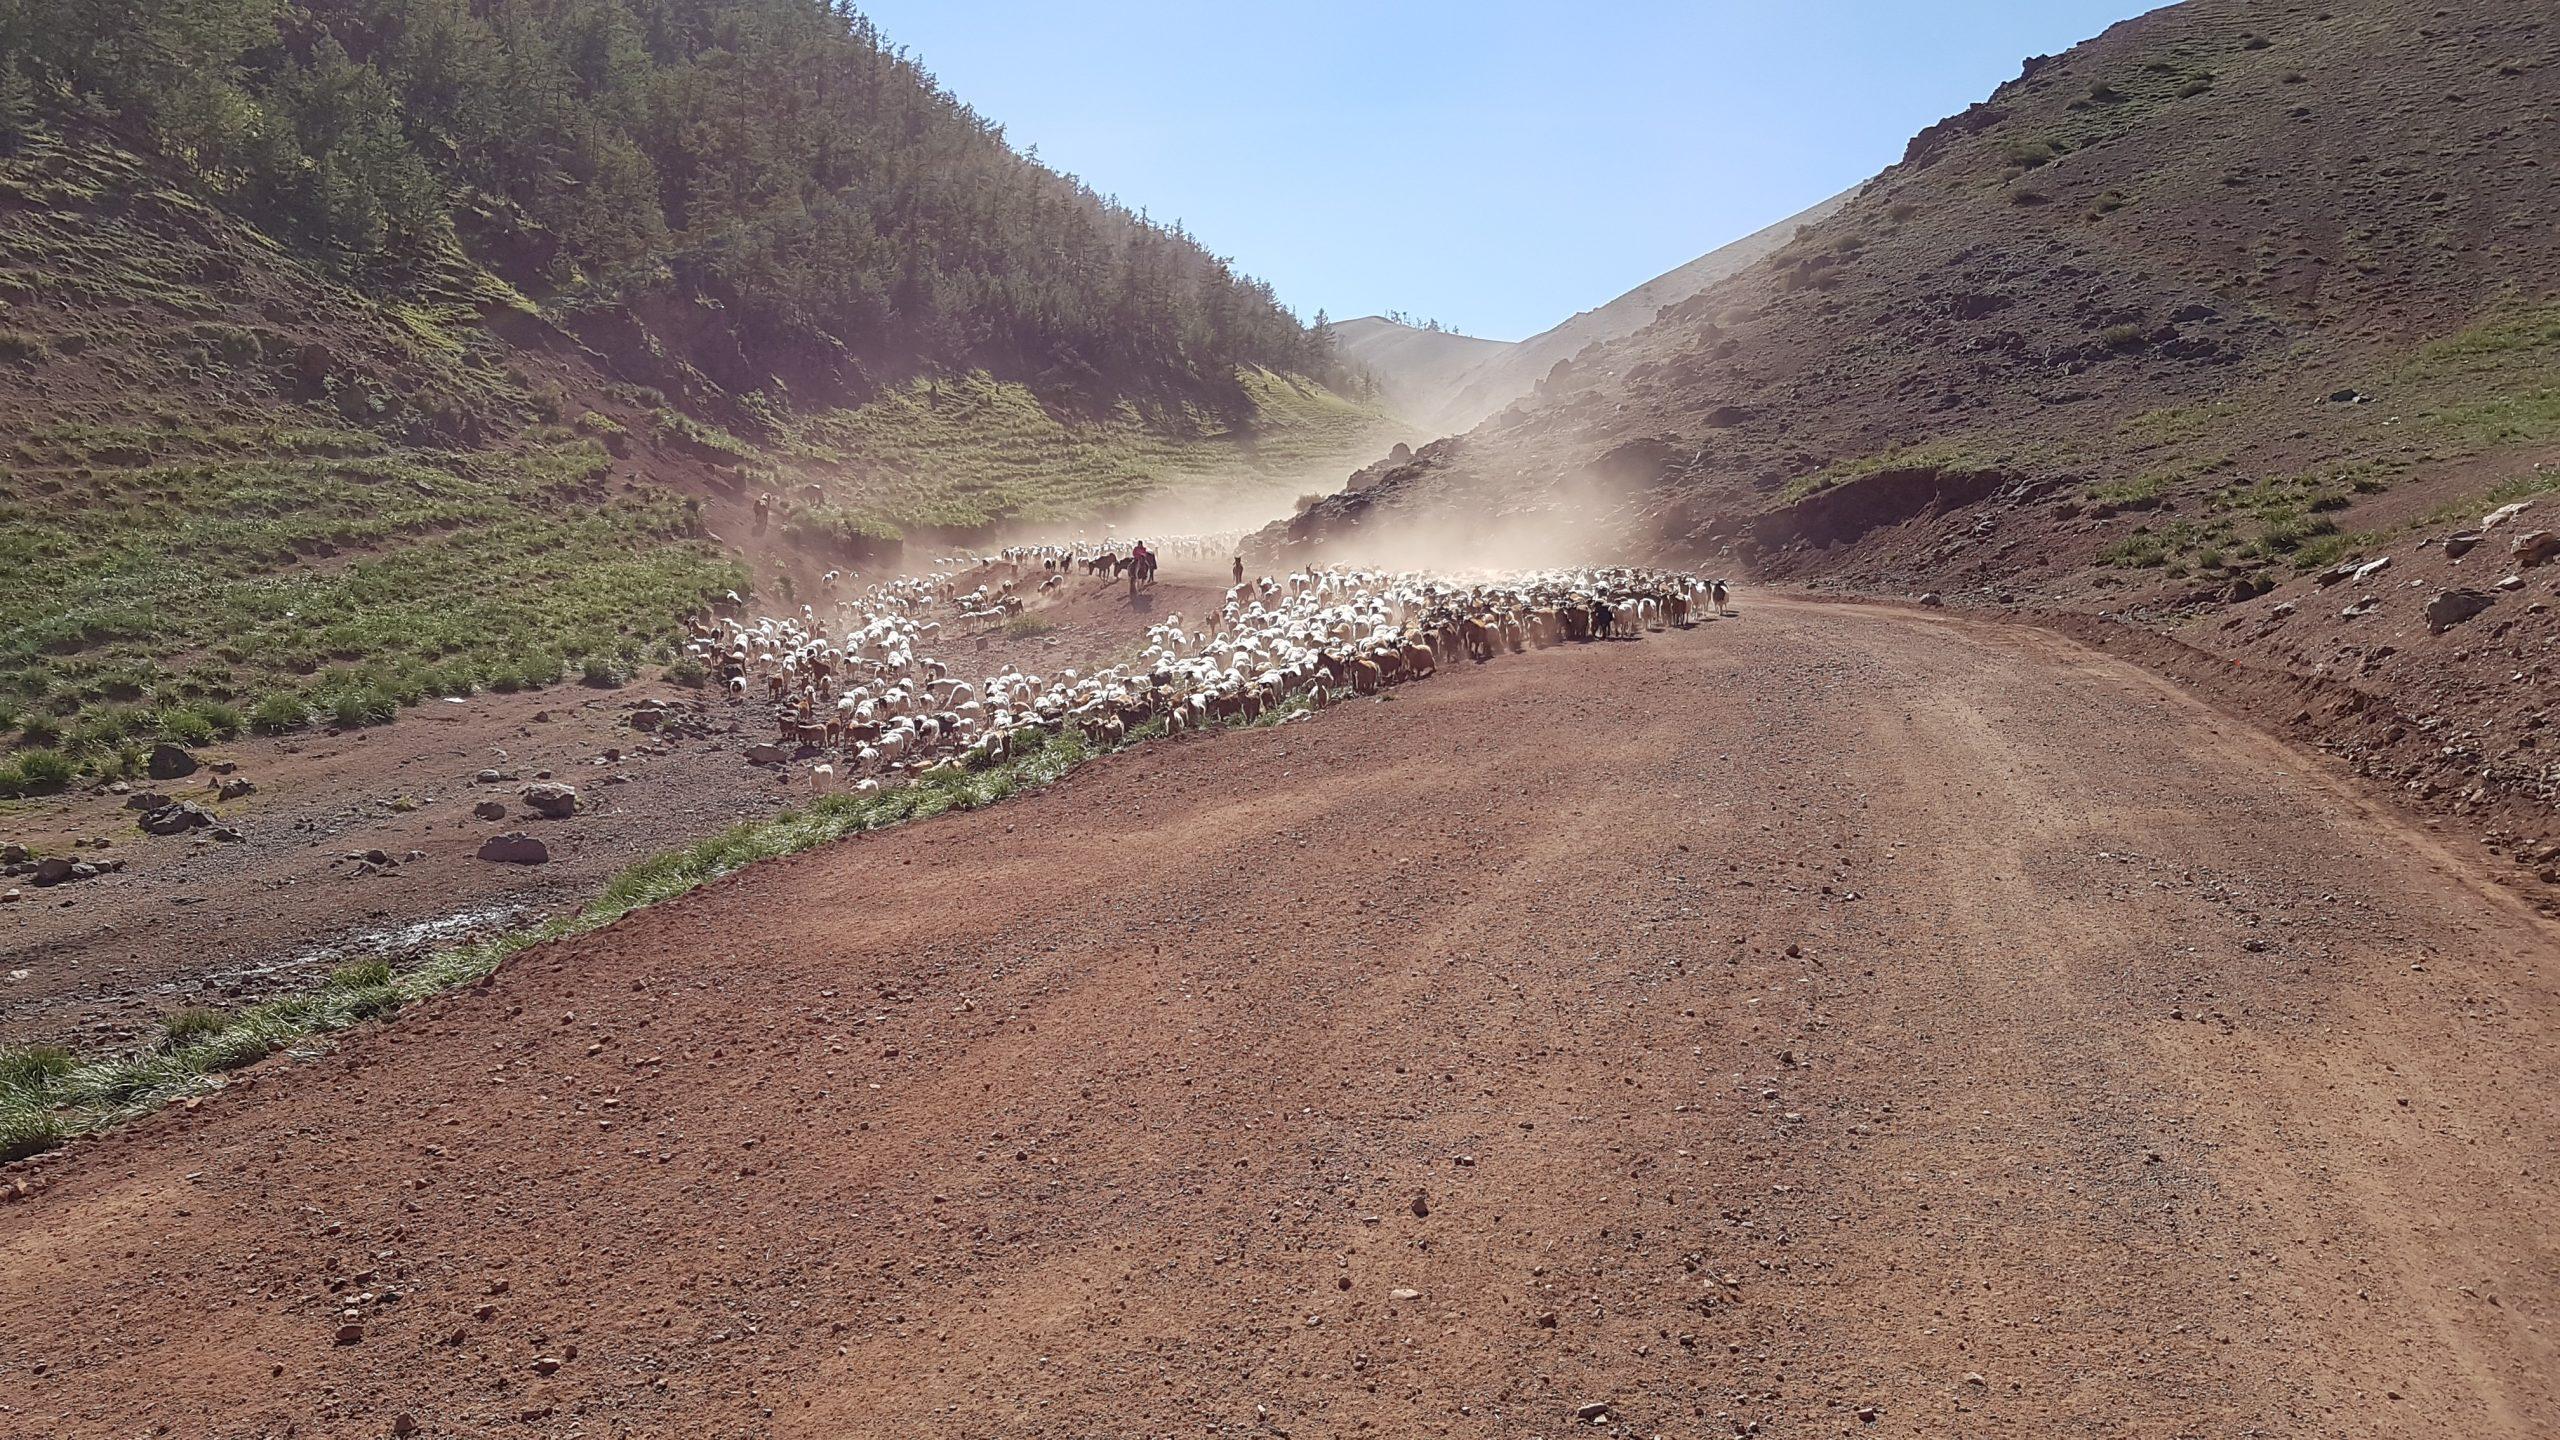 16 août : Vers le col Ulaan Davaa